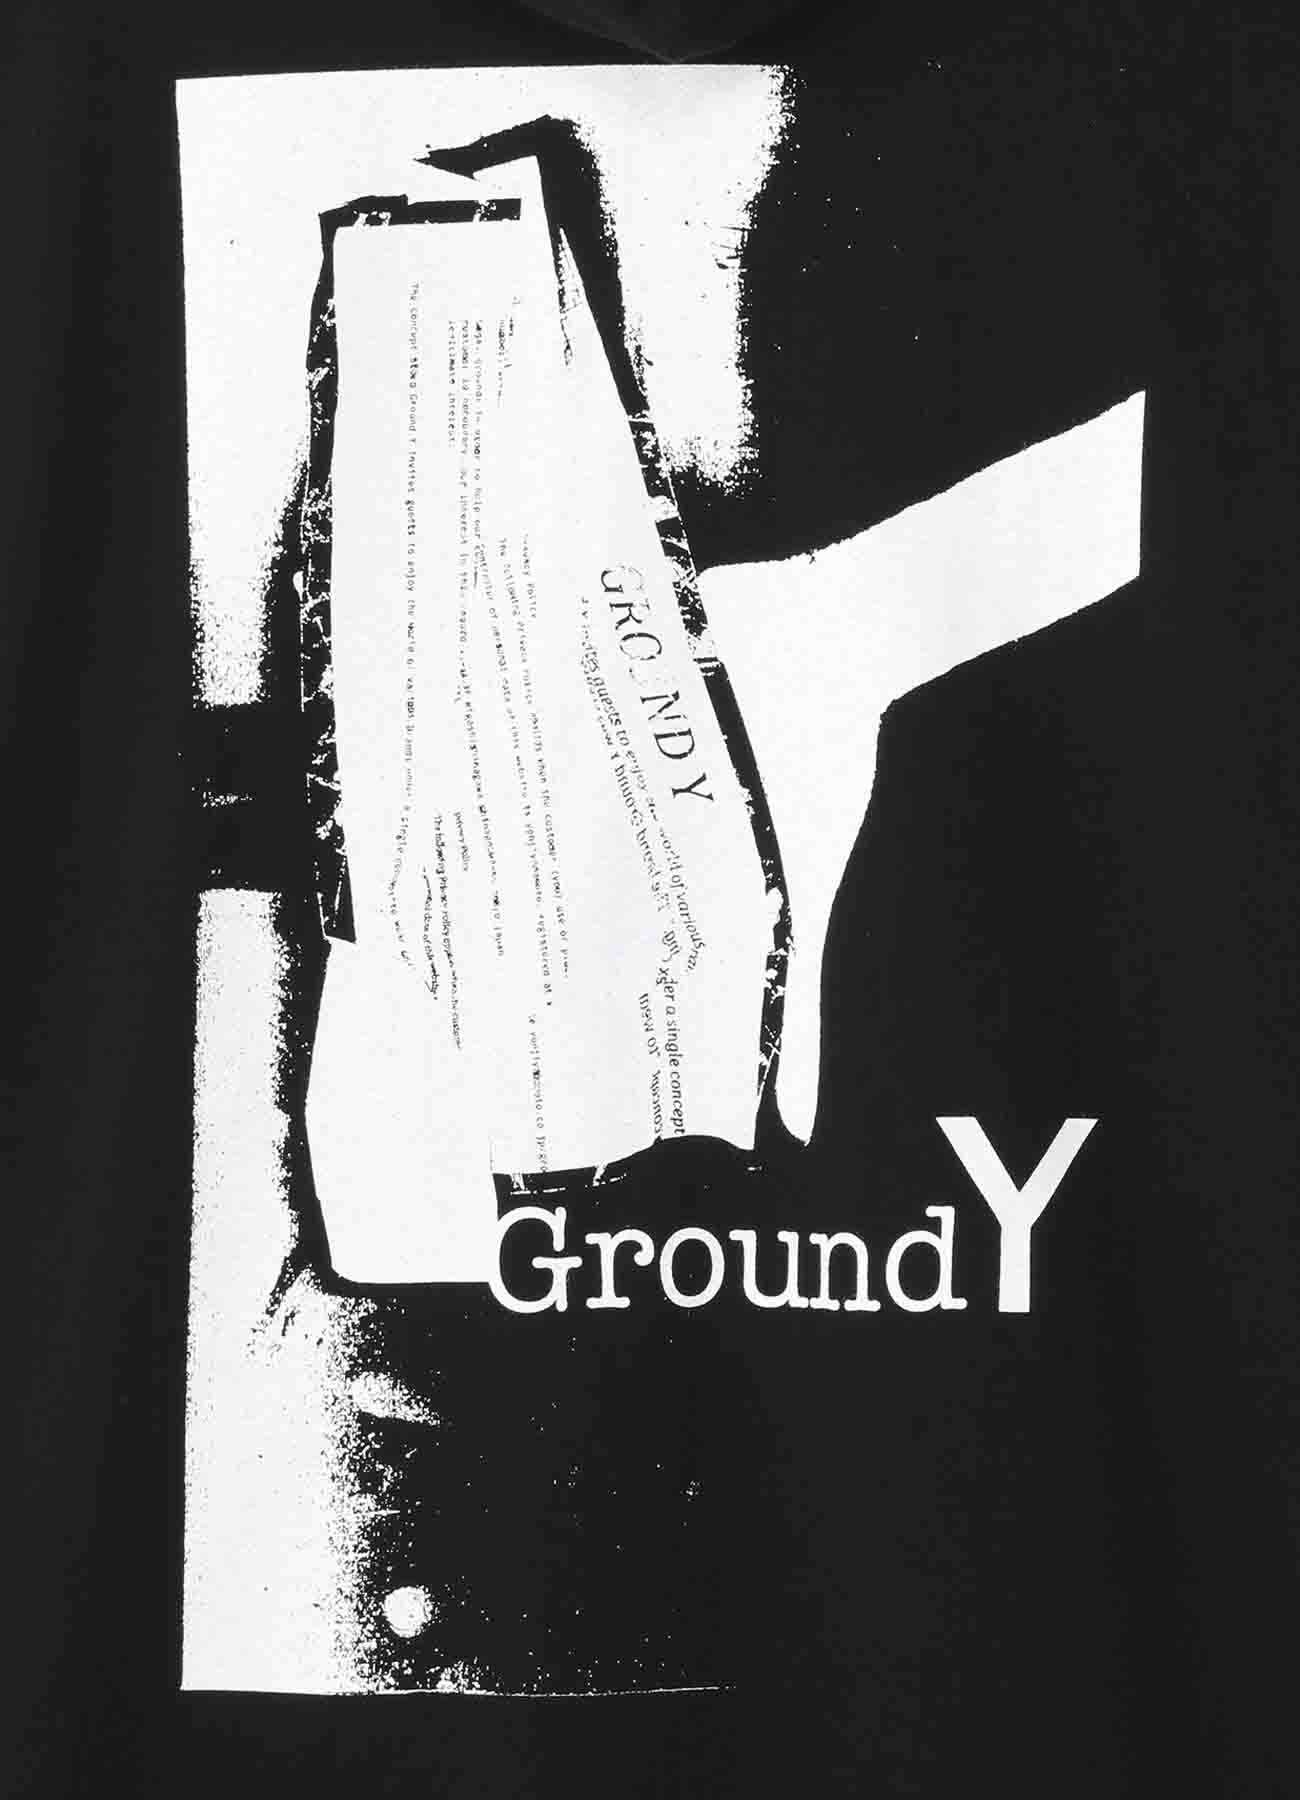 C / 5.6盎司GroundY信用裤 ZIP UP Parker